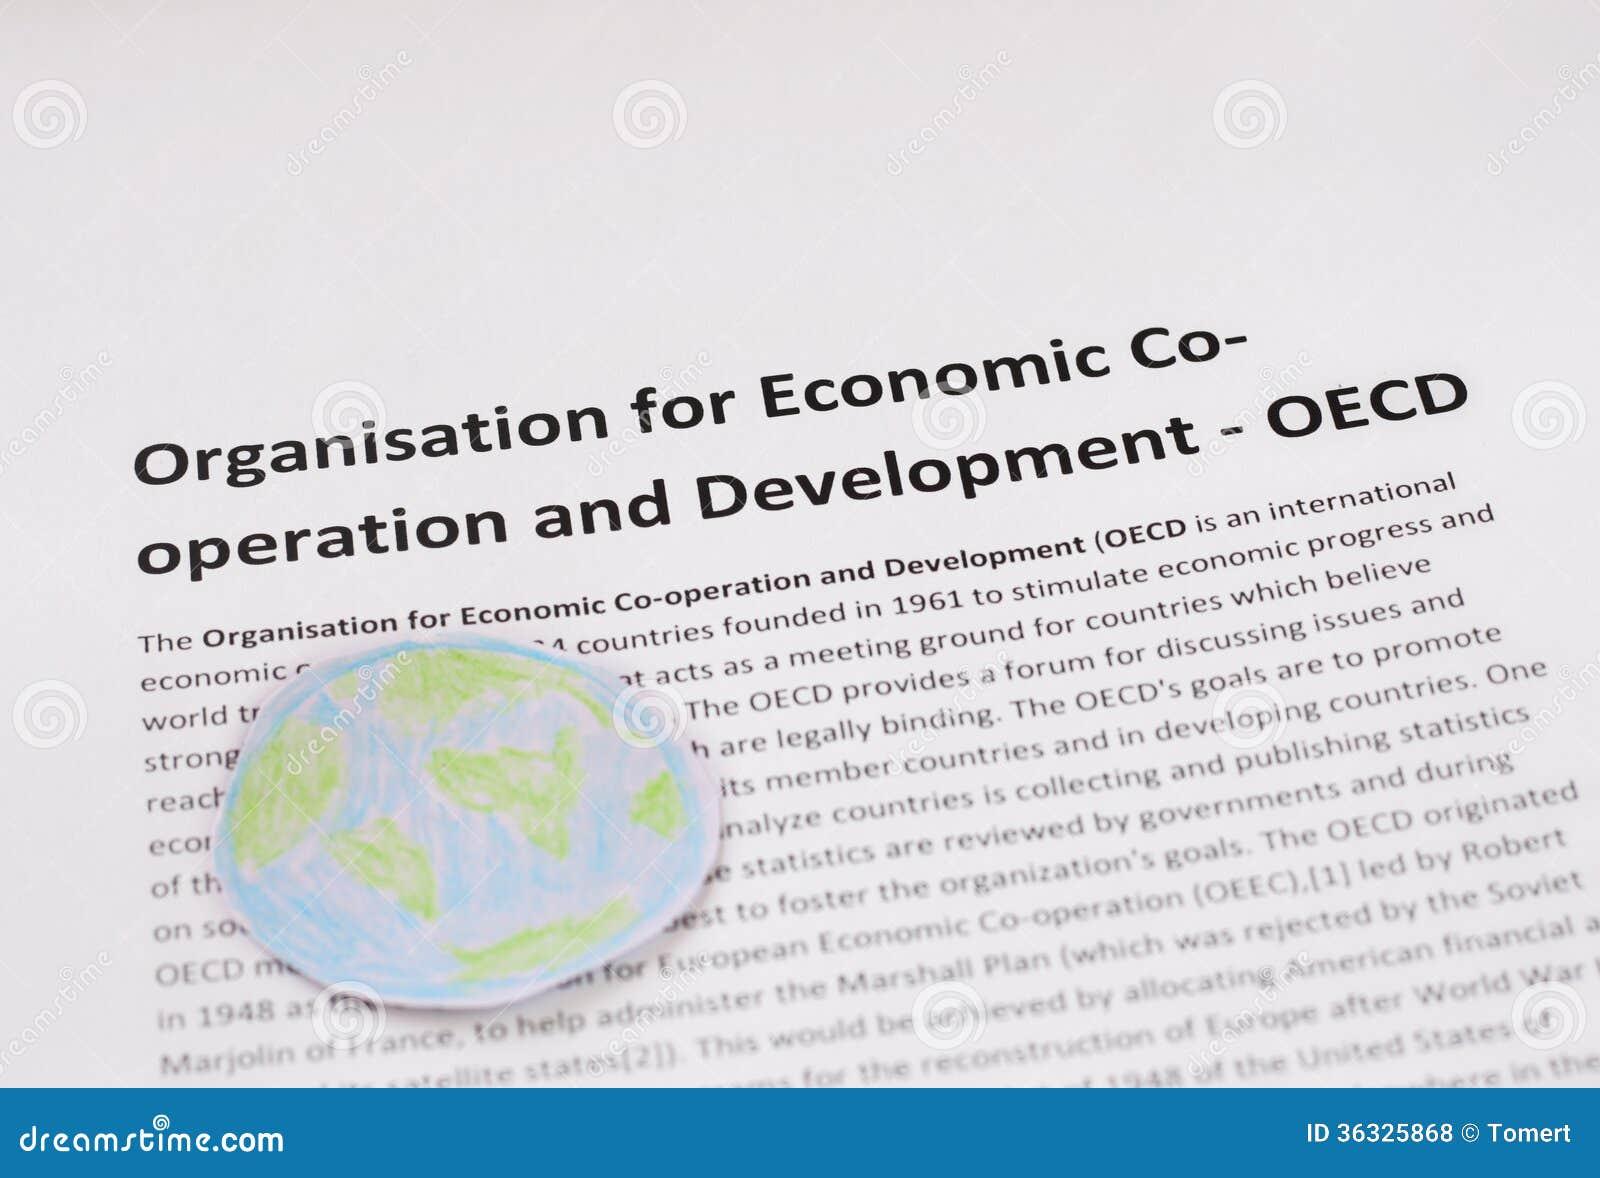 organization for economic co operation and development essay Oda official development assistance/overseas development assistance oecd organisation for economic co-operation and development ppp public-private partnership.